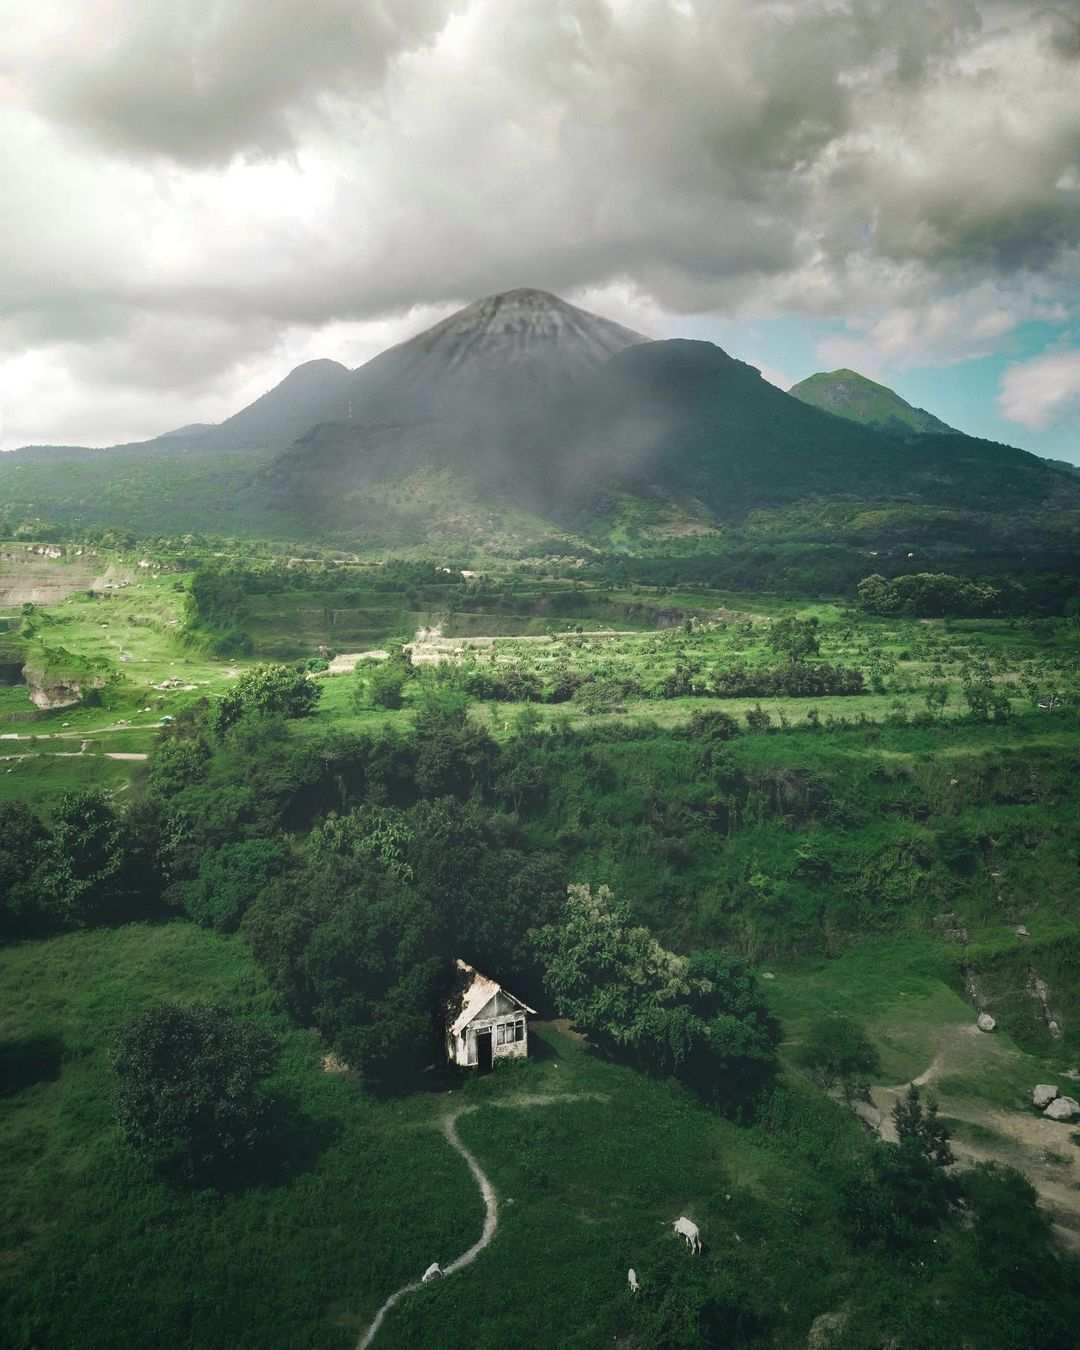 Rumah Yang di Foto Dari Atas di Ranu Manduro Mojokerto Image From @caionugroz